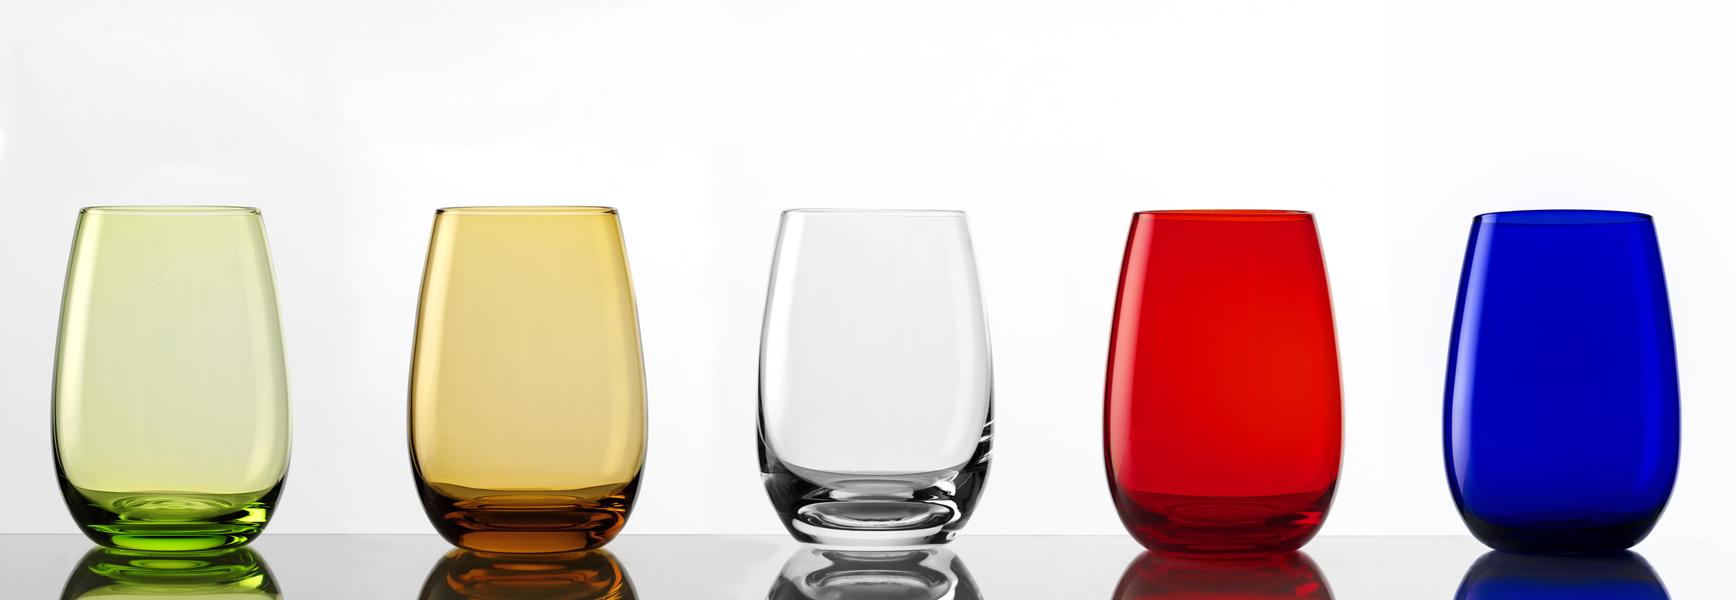 Stolzle Glaswaren Der Extraklasse Ratgeber Gastro Inn